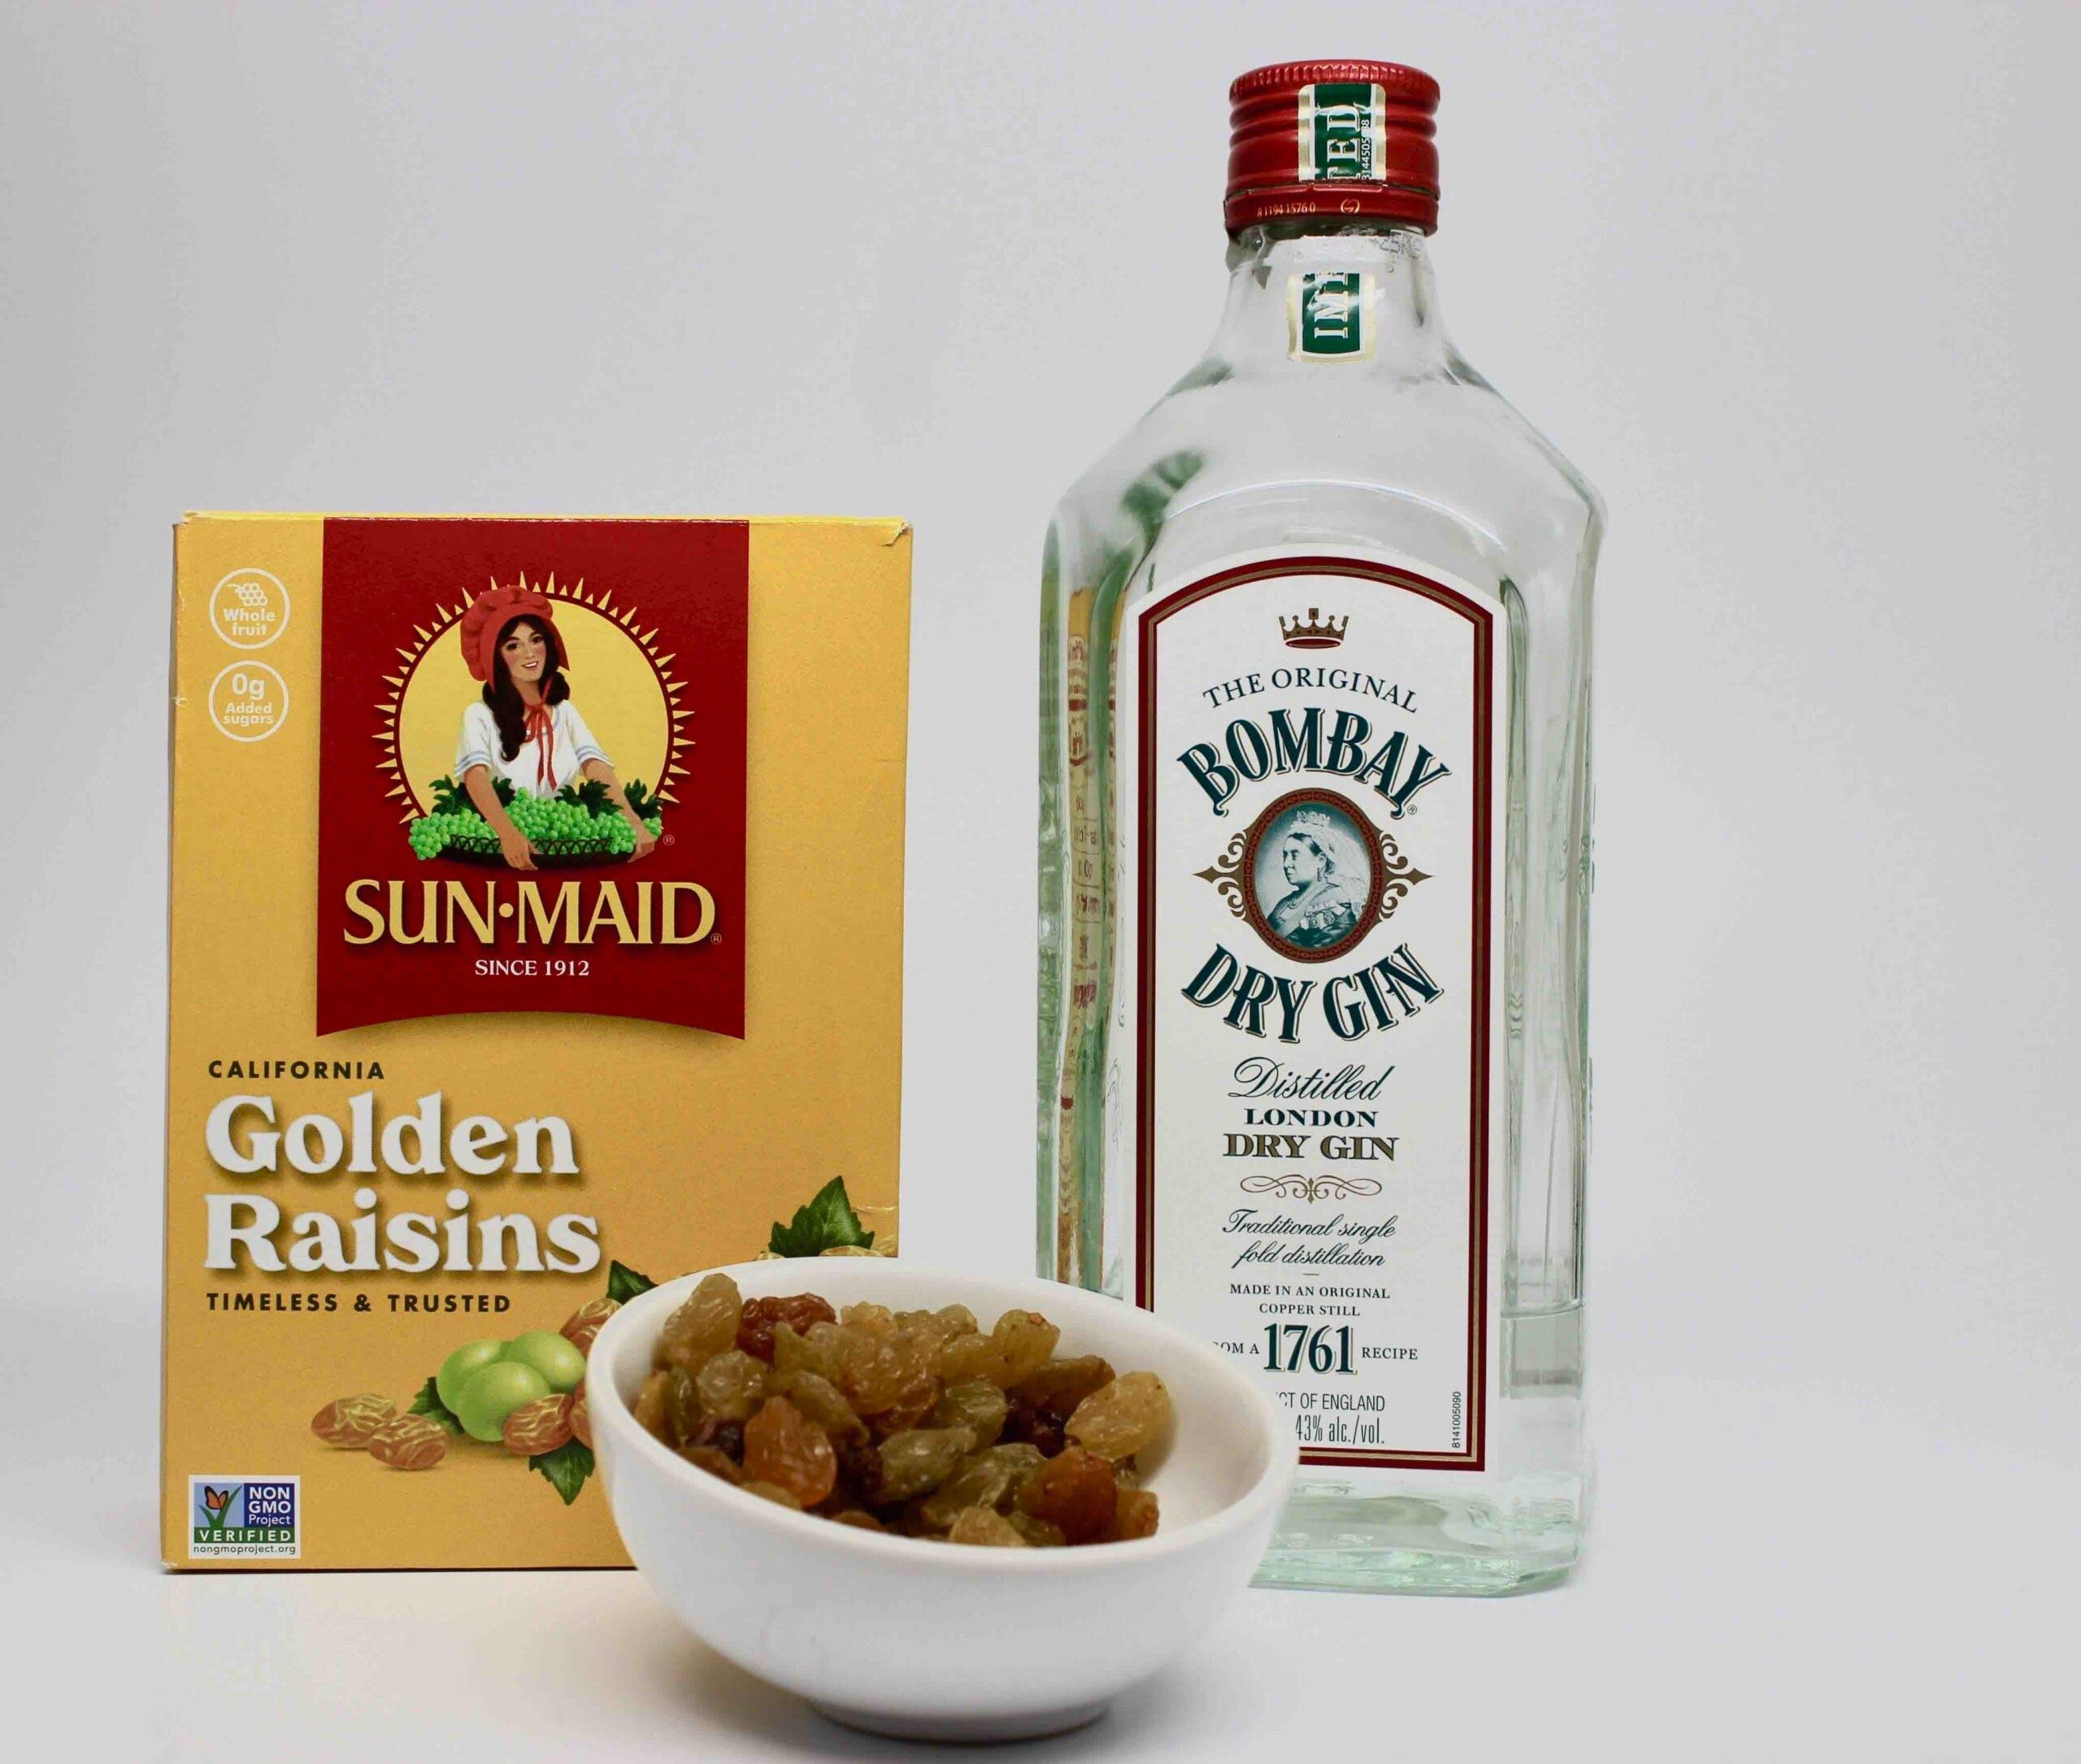 Box of golden raisins next to bottle of gin